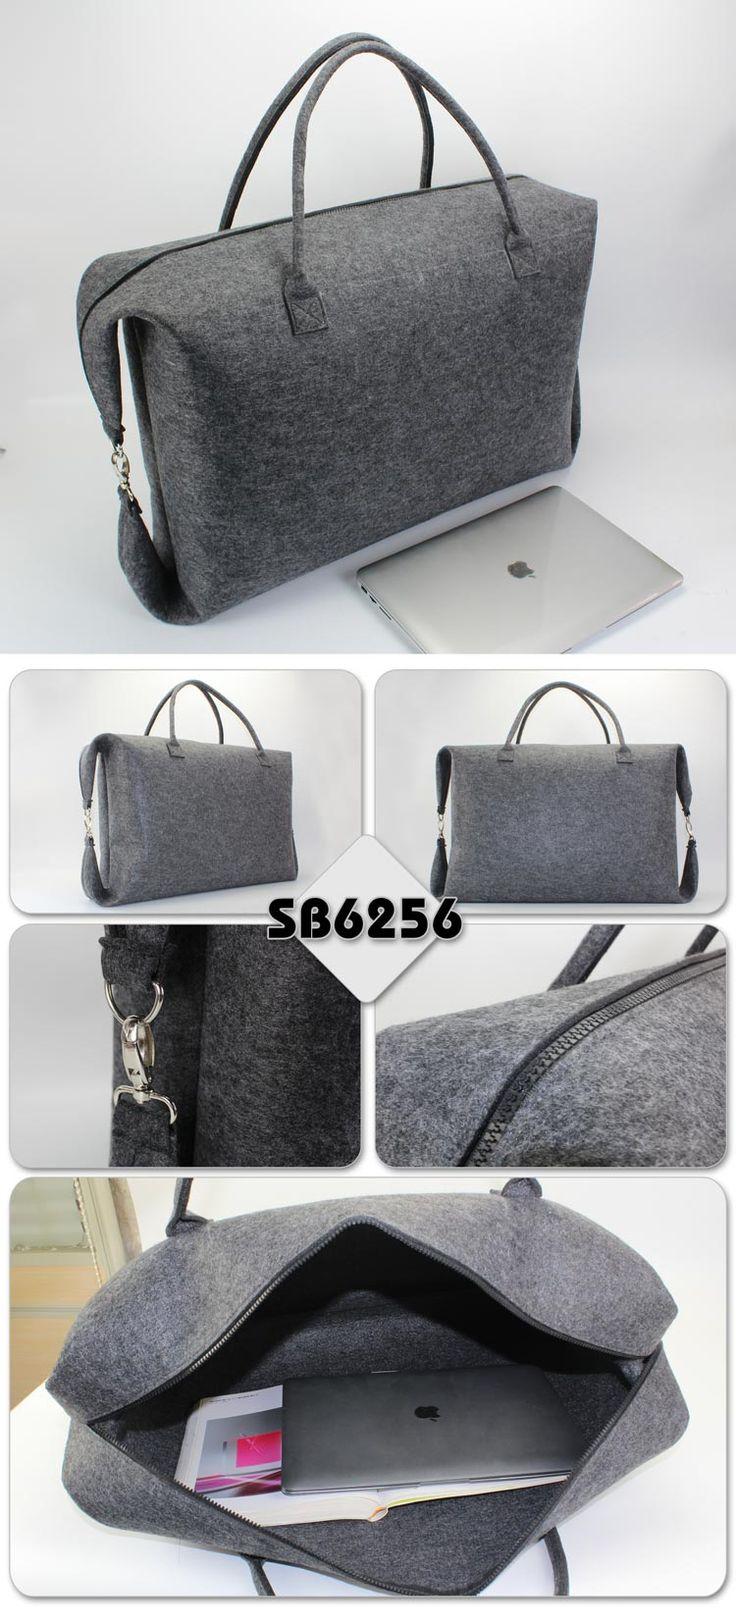 Felt Travel Bag  Description:        ● Material:3MM felt    ● Size:58*40*18CM    ● Big logo printing area    ● OEM design is welcome www.ideagroupigm.com